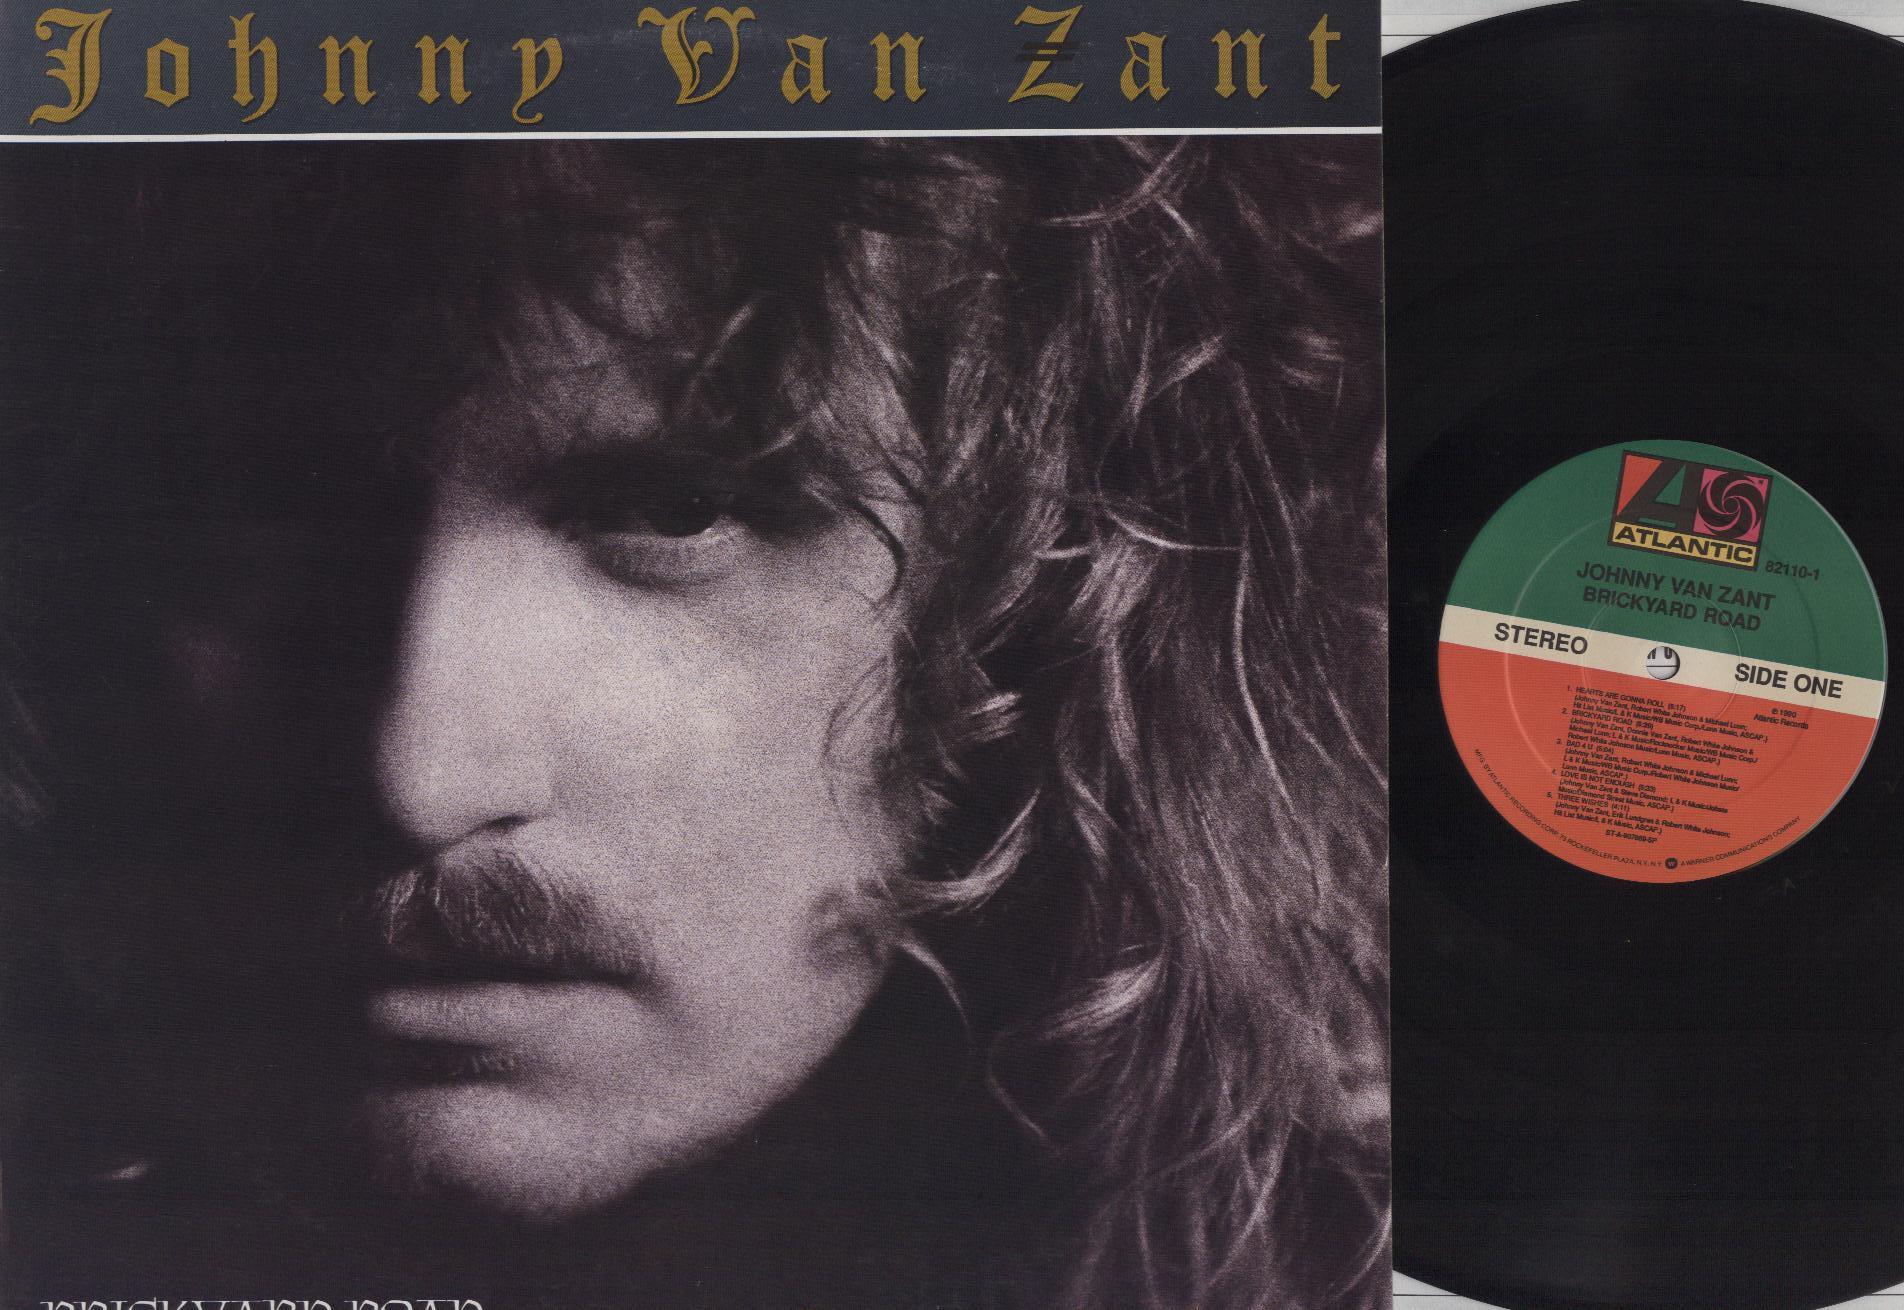 Johnny Van Zant - Brickyard Road - LP